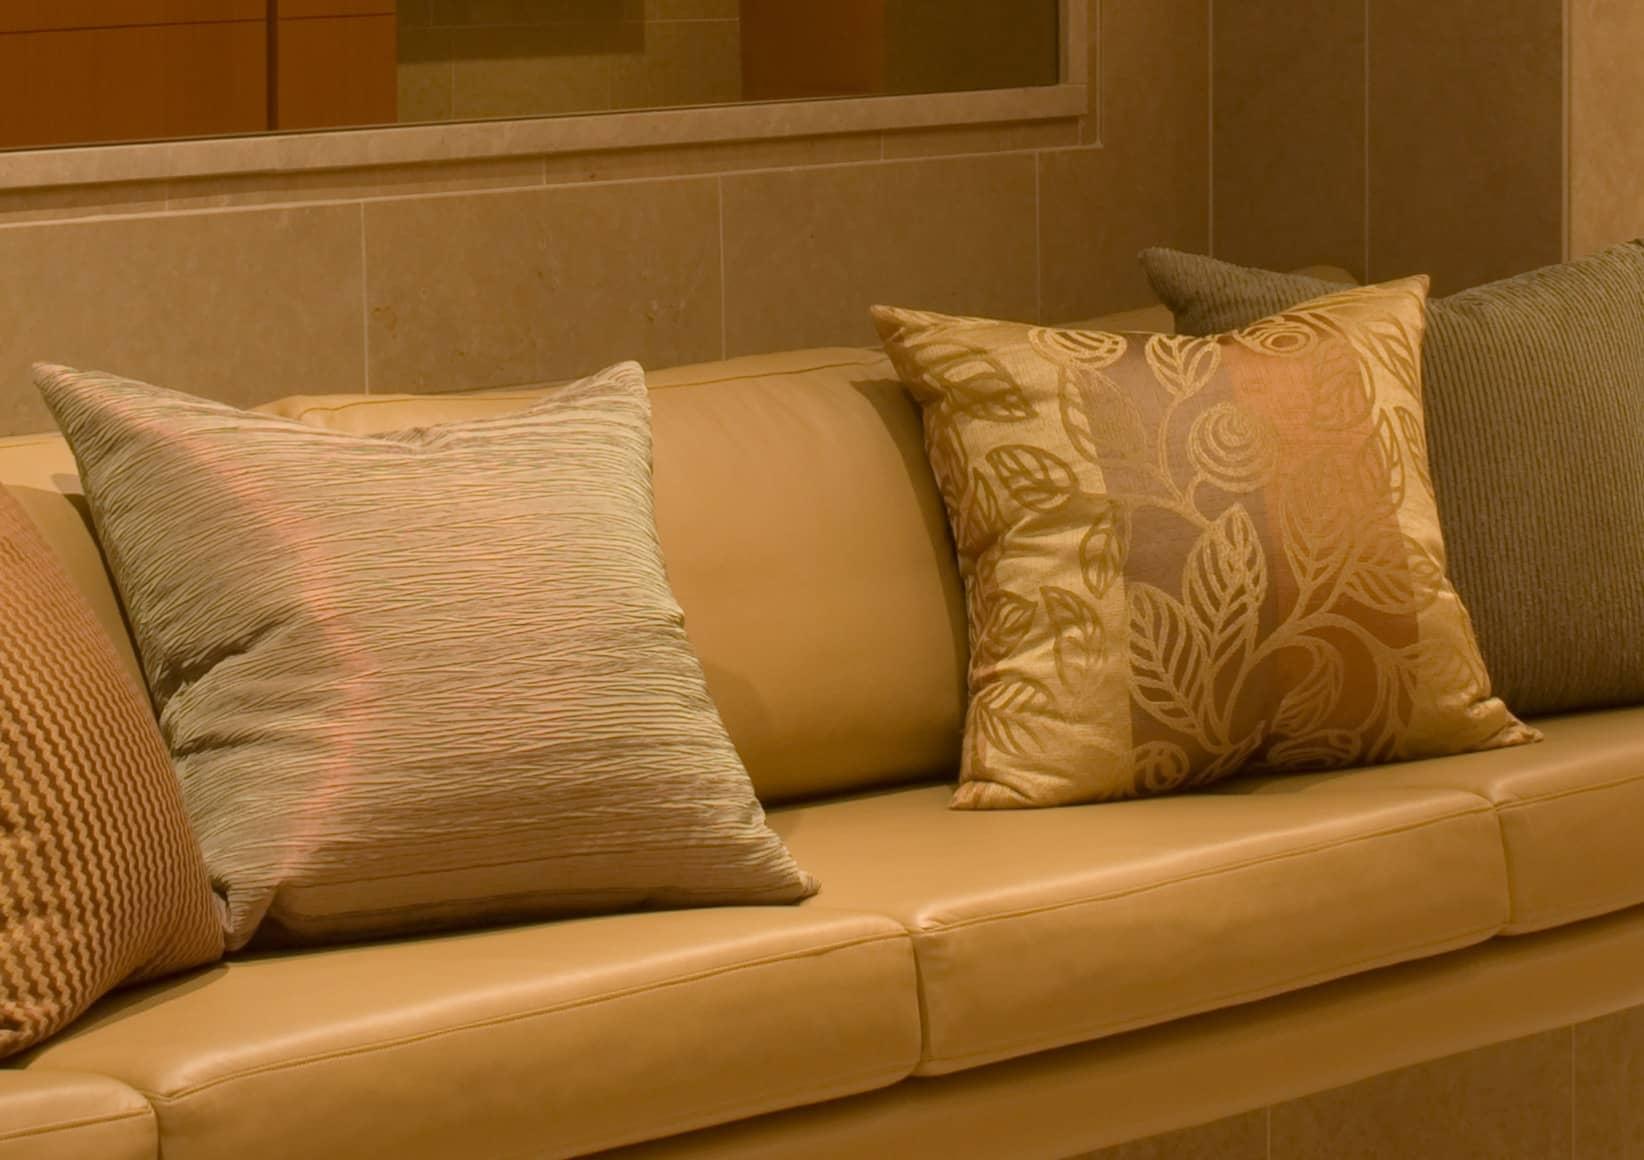 Close-up photo of leather sofa.